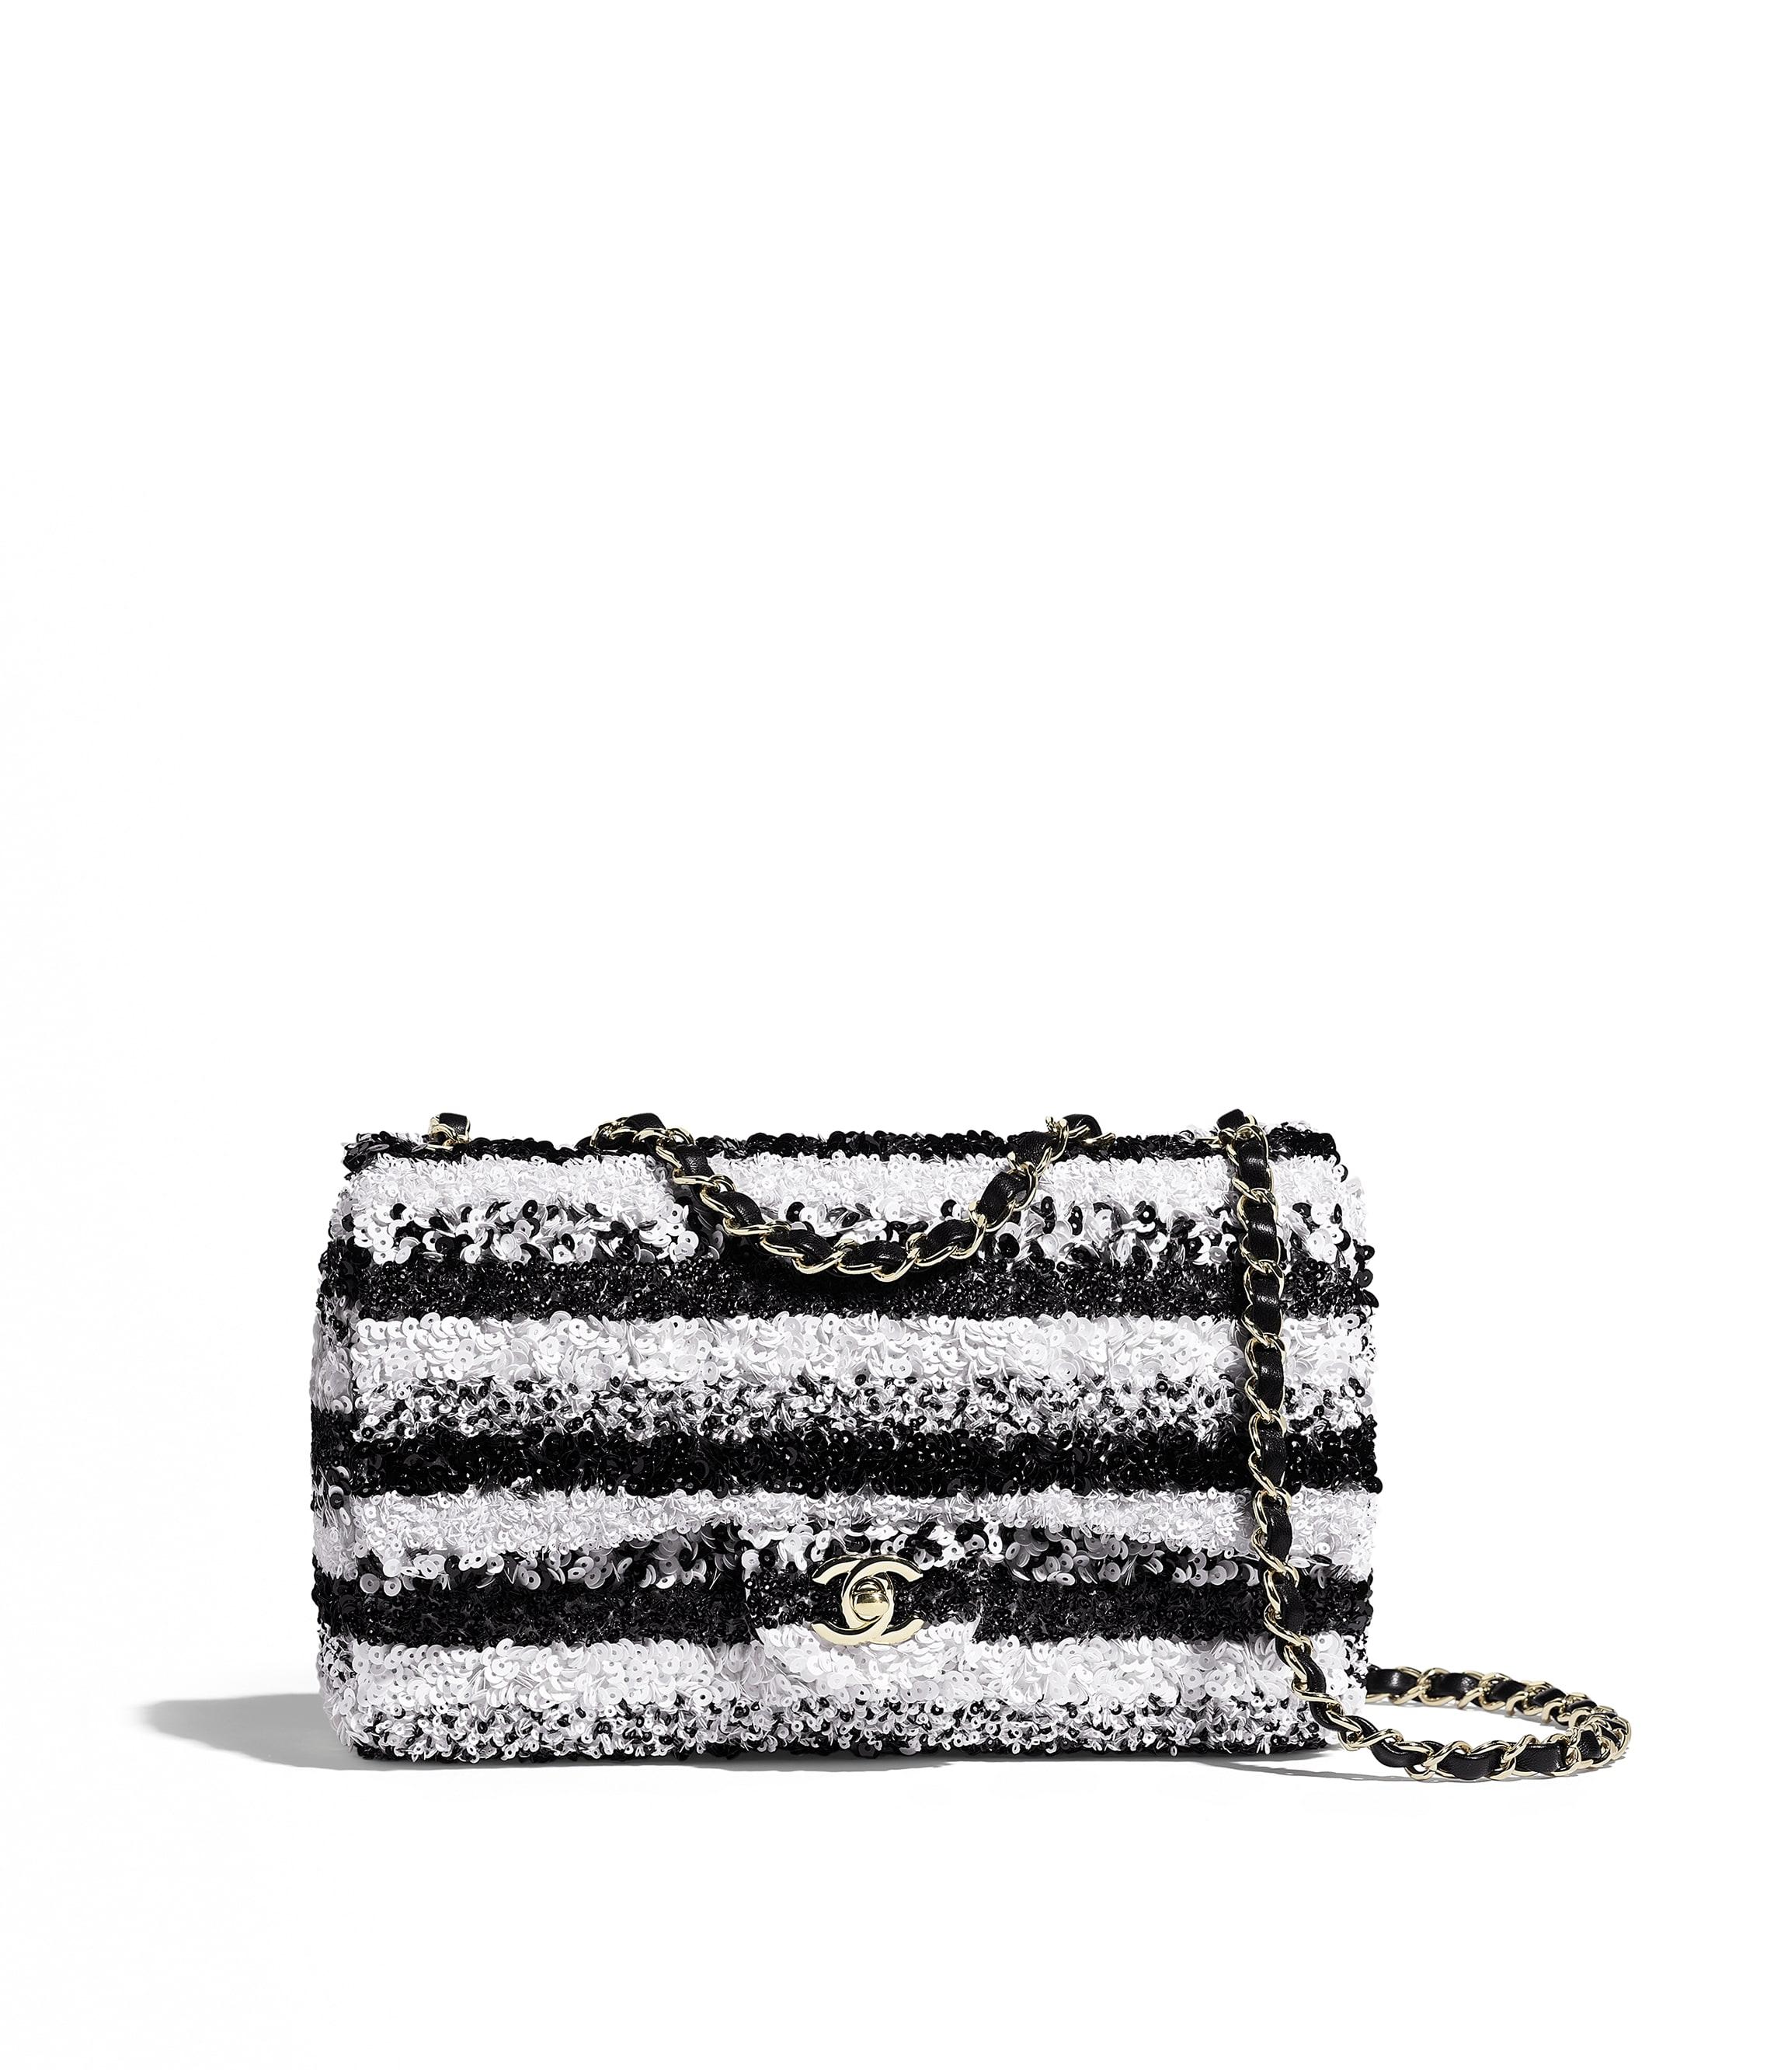 13ed12031cc7 Flap Bag, sequins & gold-tone metal, white & black - CHANEL